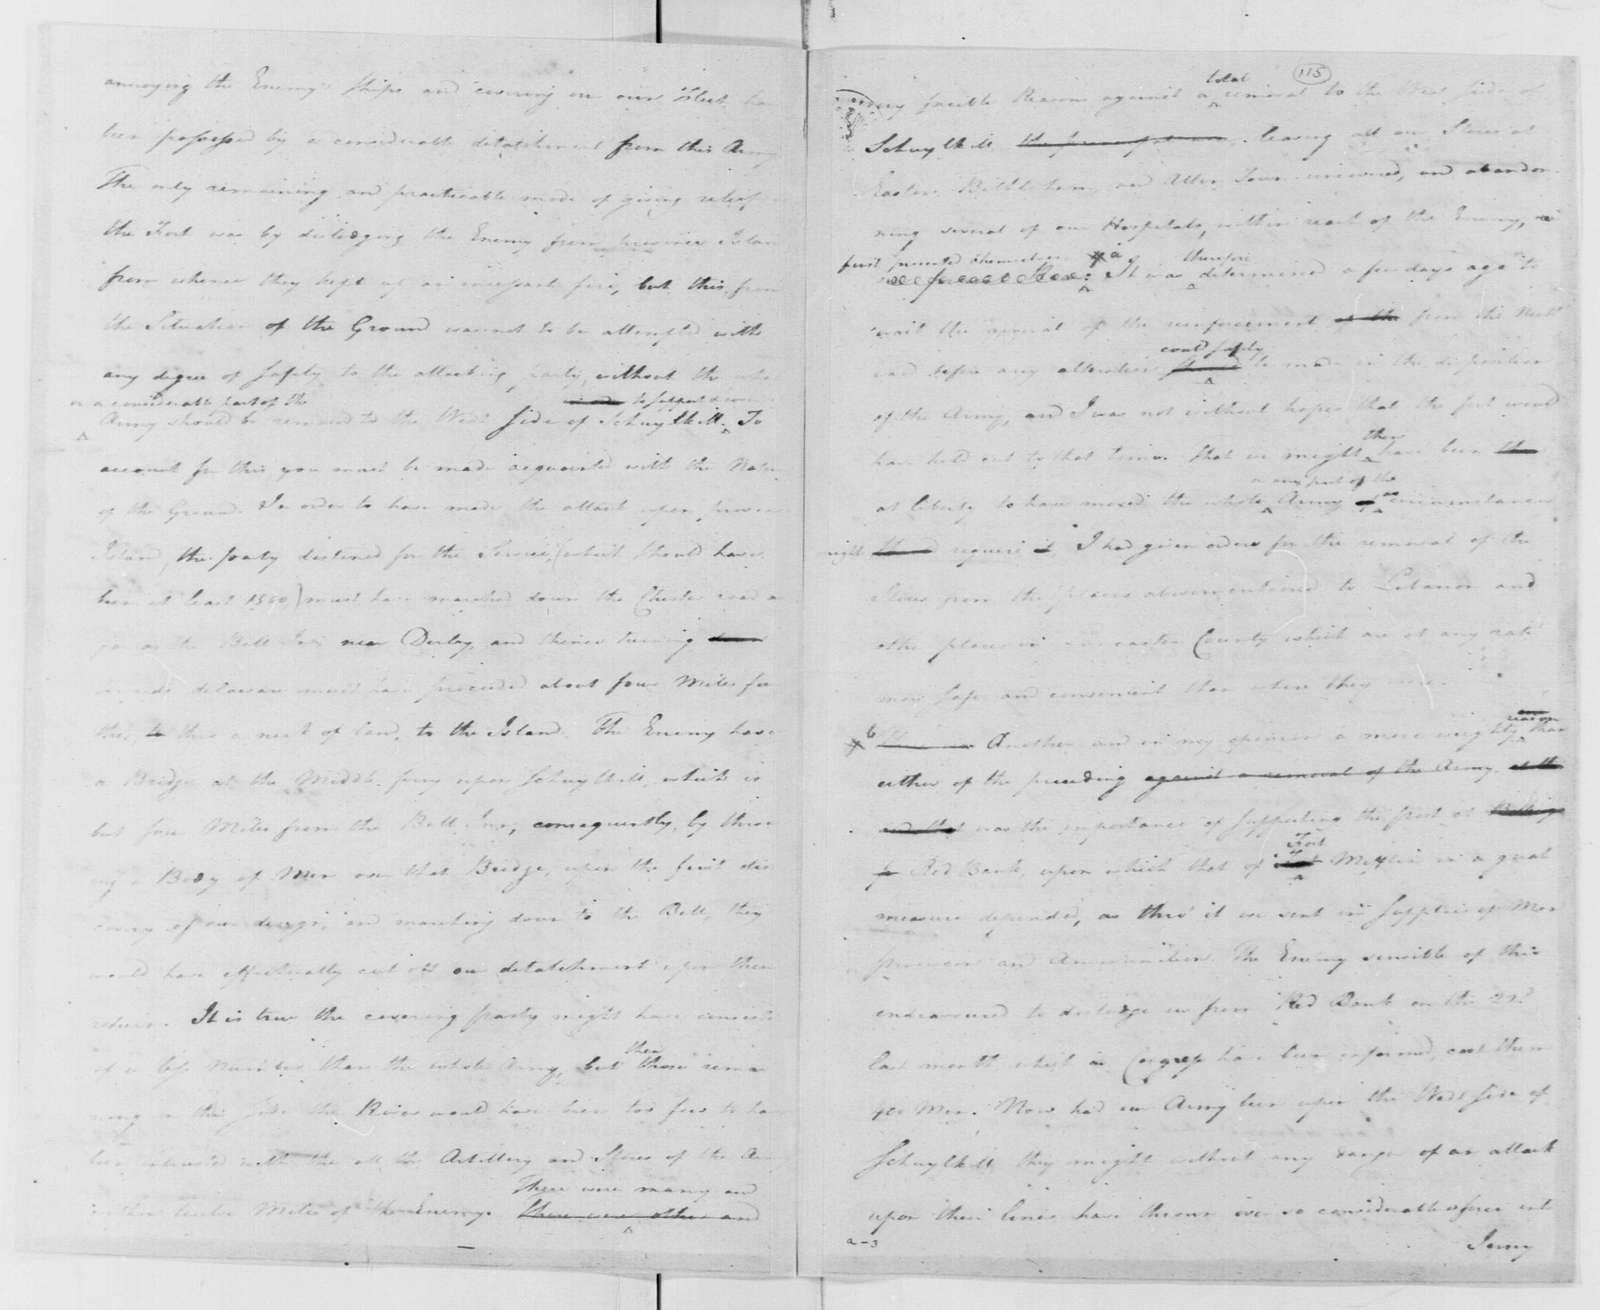 George Washington Papers, Series 4, General Correspondence: George Washington to Continental Congress, November 17, 1777